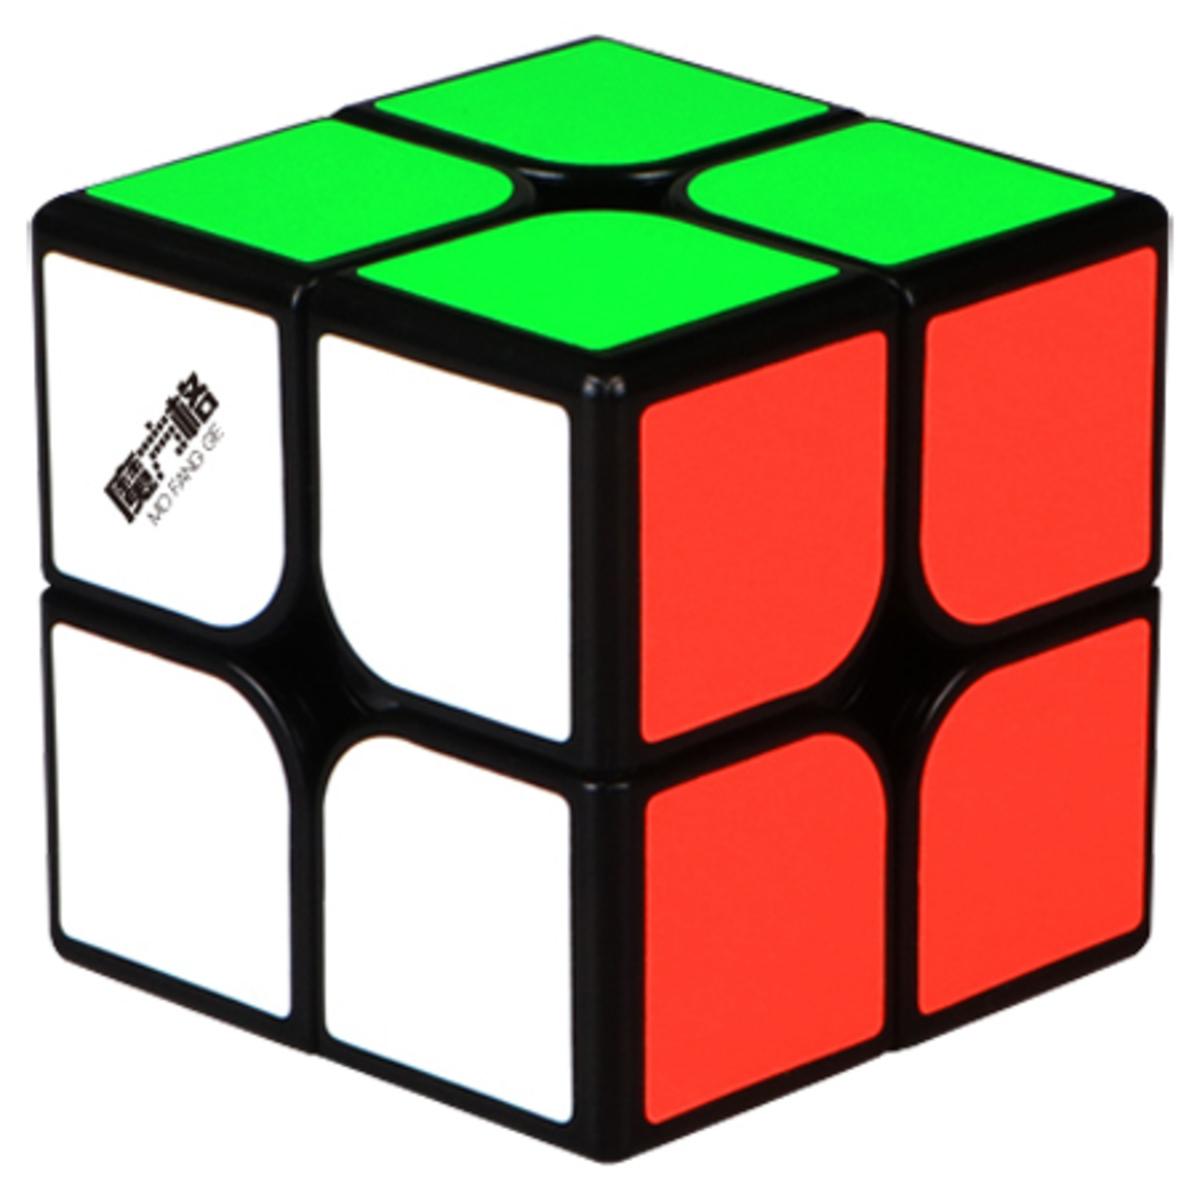 2x2x2 Wuxia M